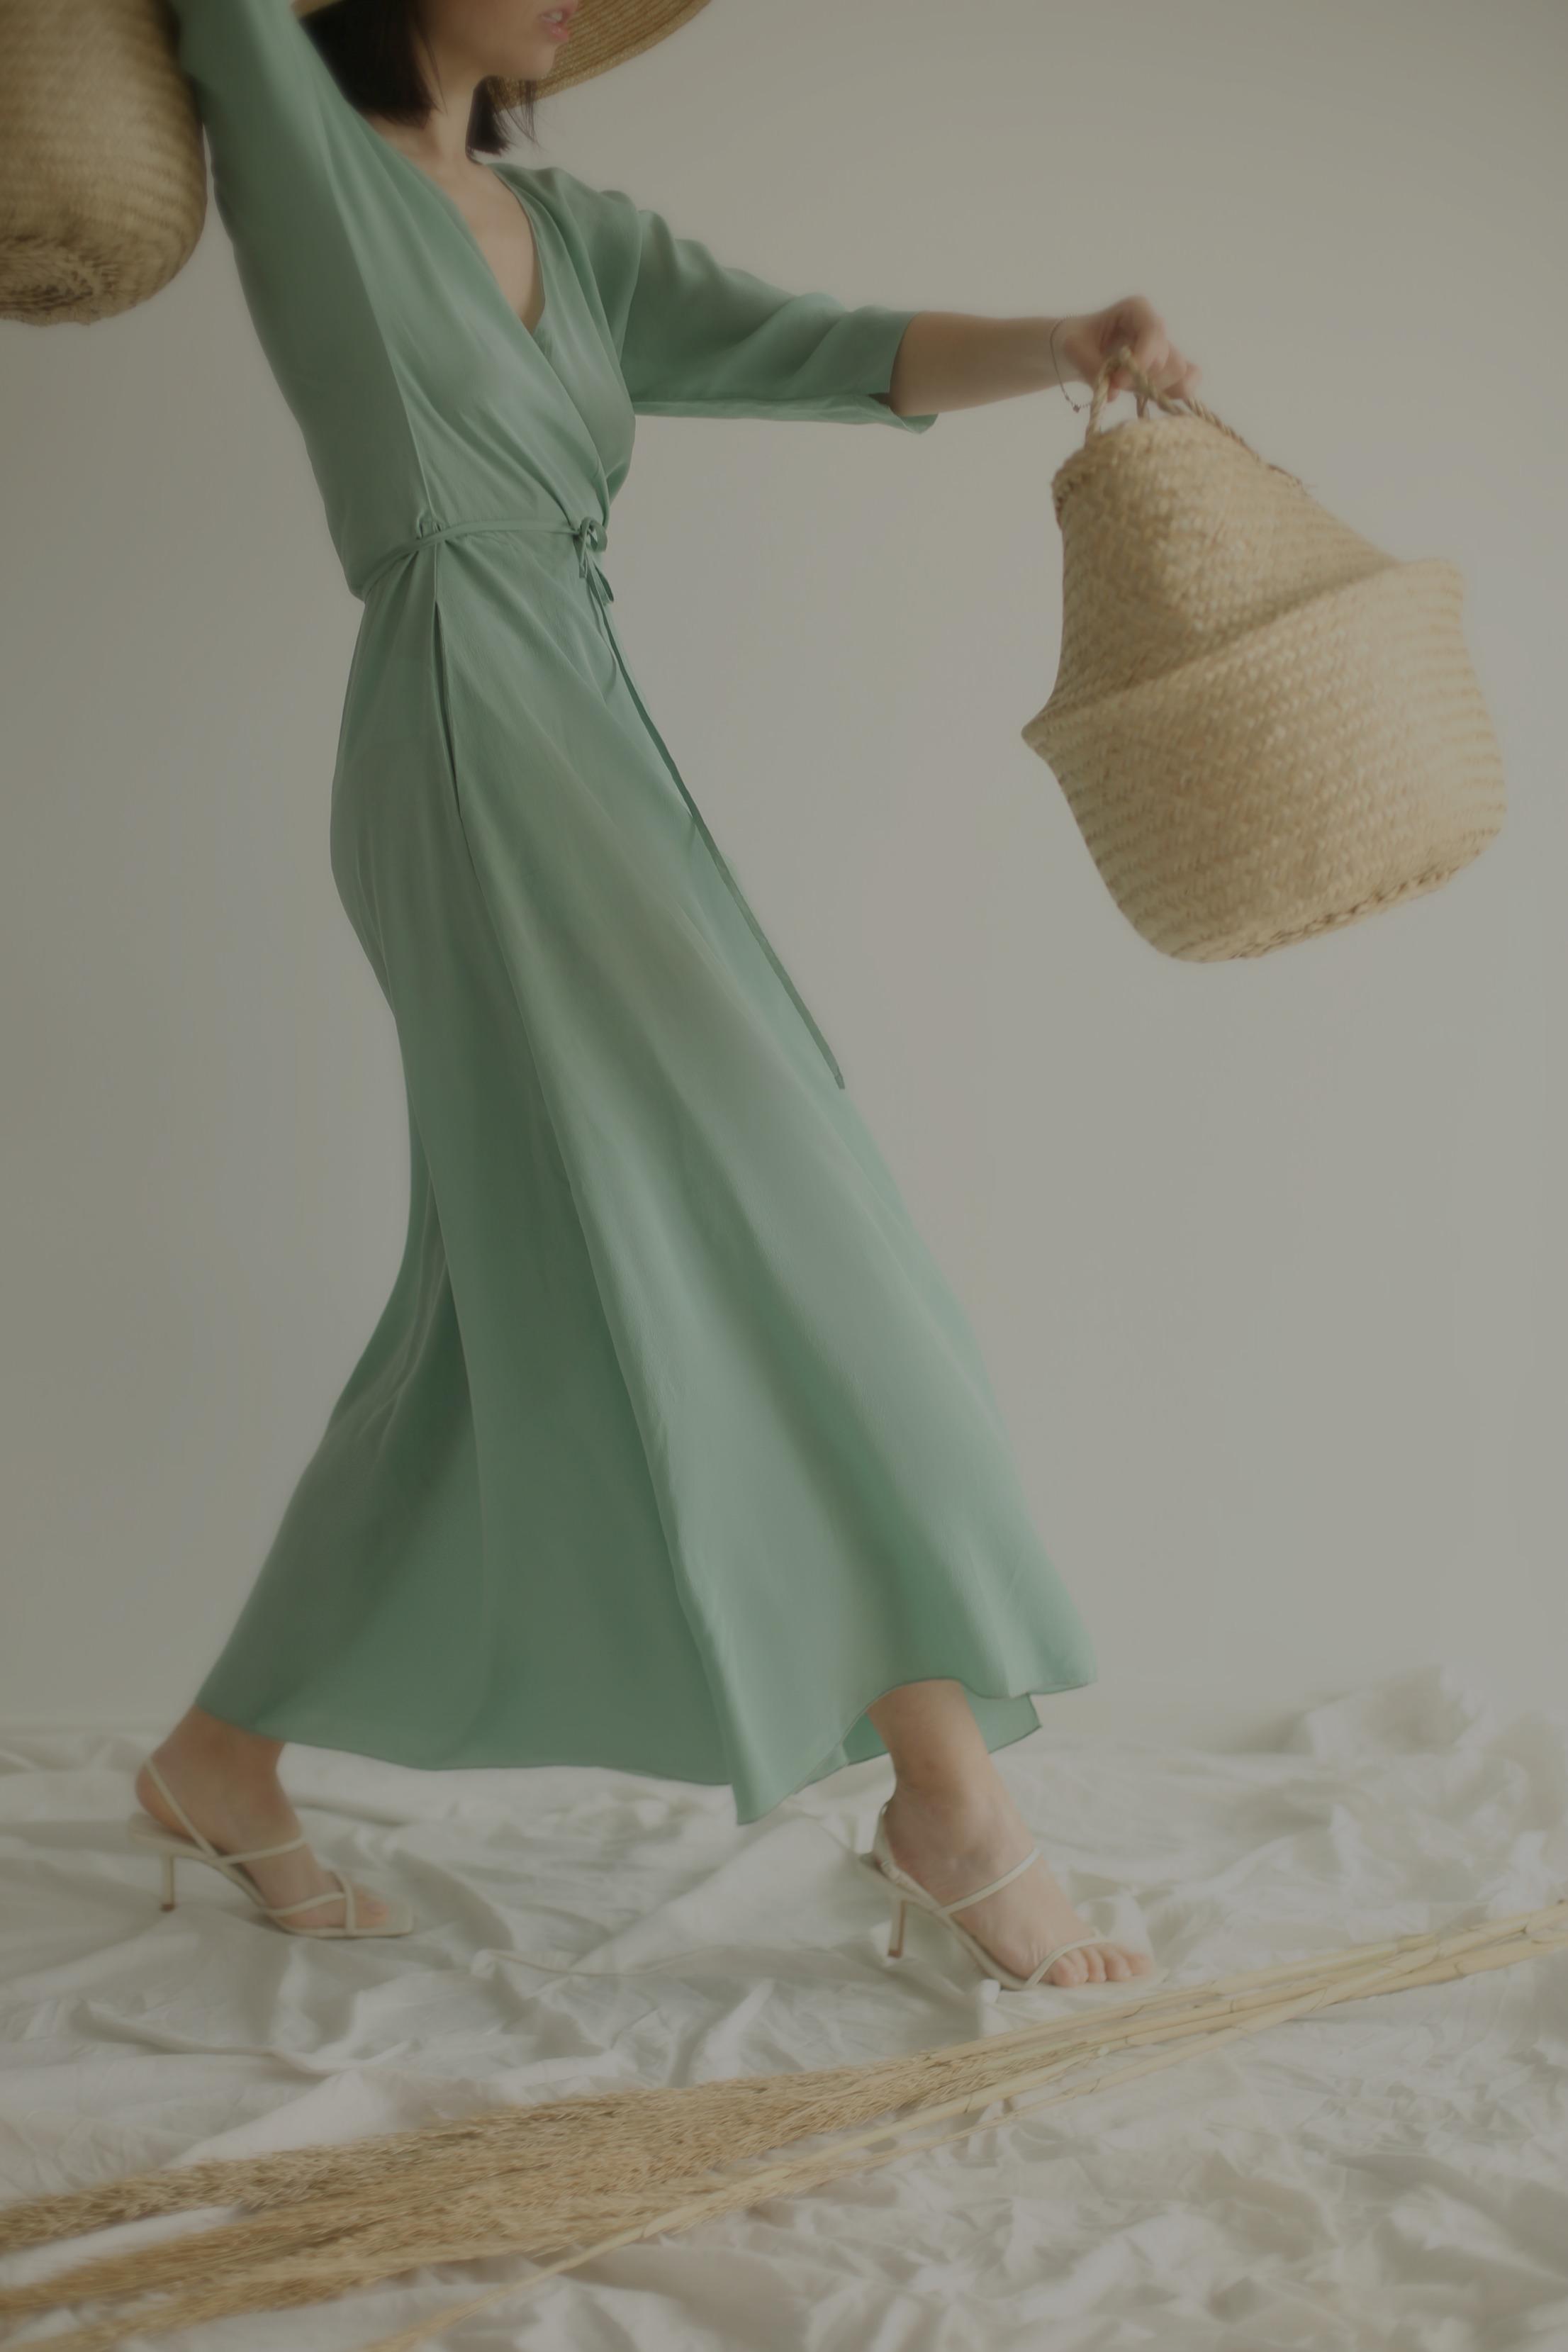 pomandere abito, theladycracy.it, elisa bellino, fashion influencer italiane famose instagram 2019, fashion blogger italiane famose 2019, fashion blogger italia 2019,  montegallo hat